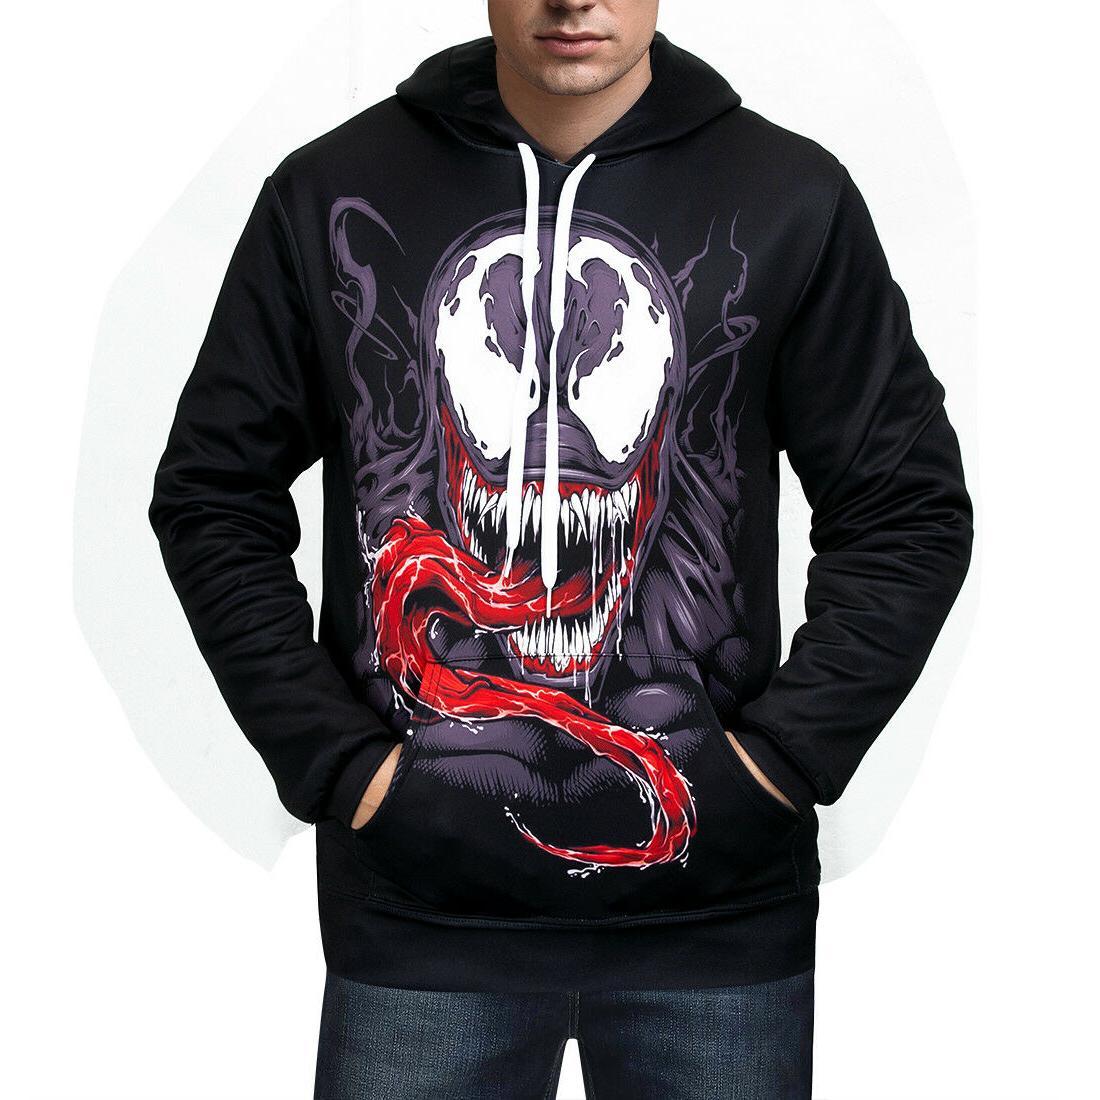 Women/Men UFC Hoodies Print Marvel Venom Sweater Jacket